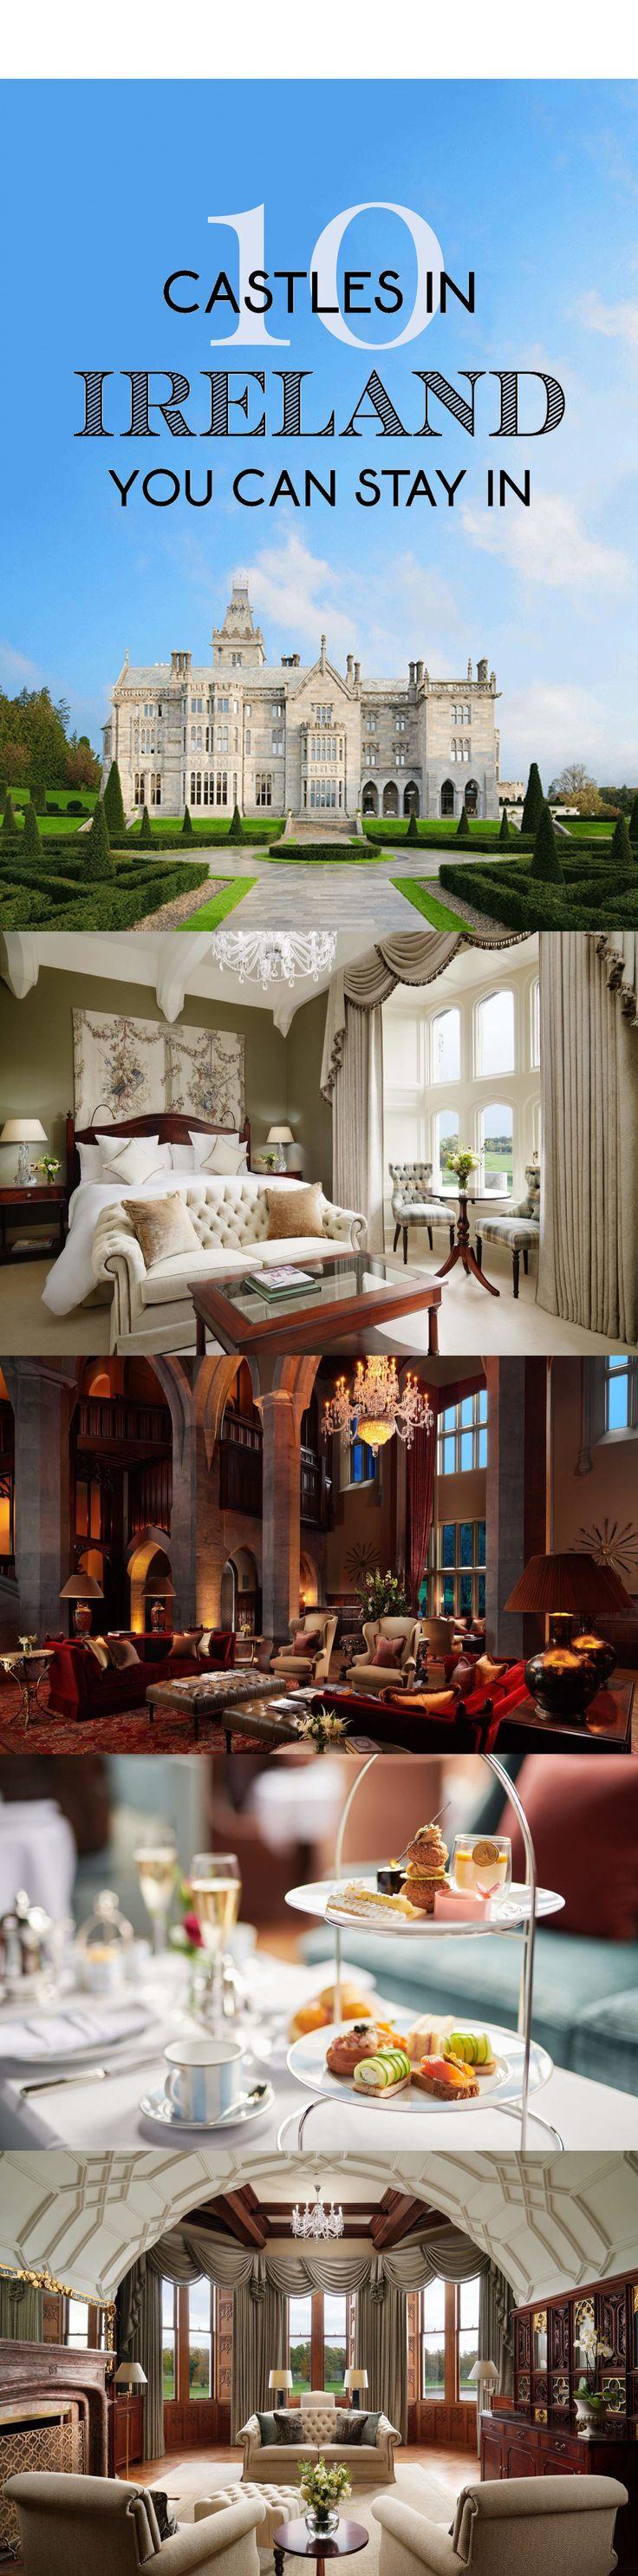 Best 25+ Scotland hotels ideas on Pinterest | Hotels in edinburgh ...